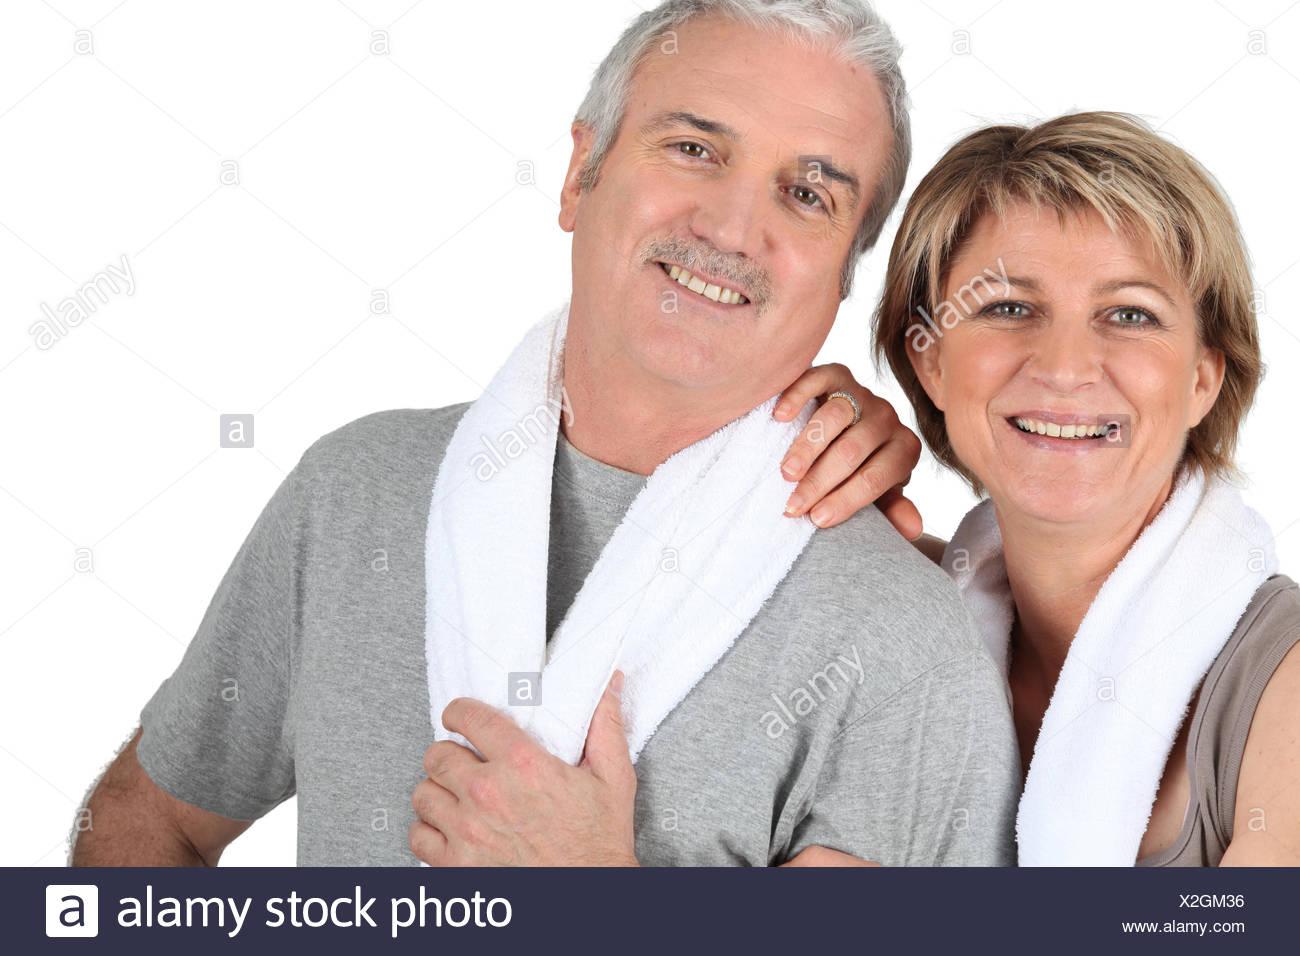 cool, center, burning, calories, ardour, adherent, couple, pair, woman, lose, - Stock Image